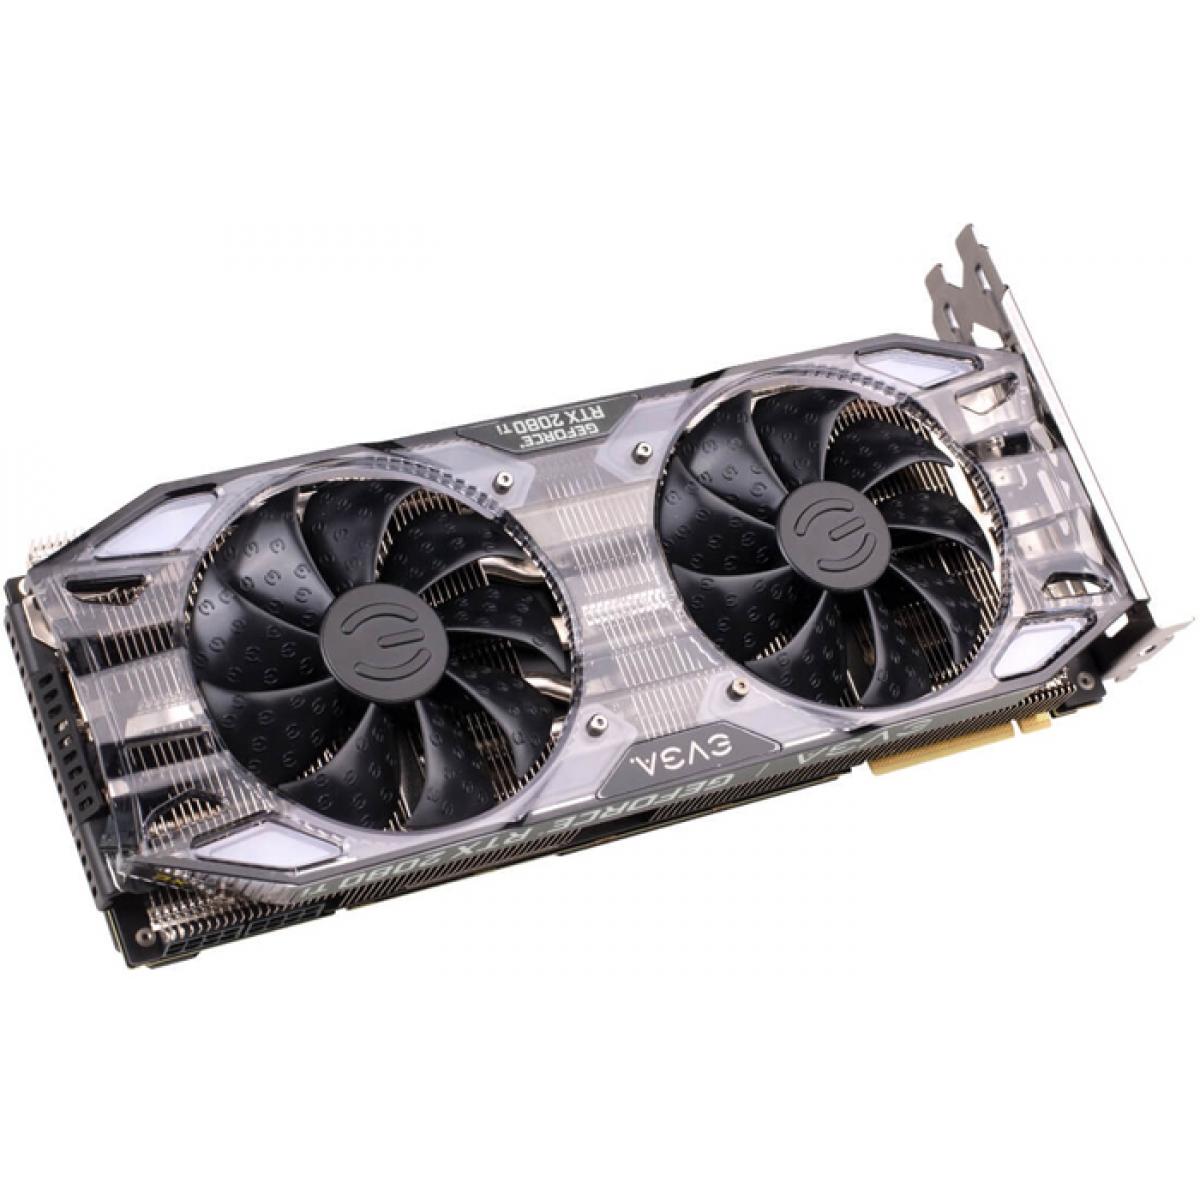 Placa de Vídeo EVGA Geforce RTX 2080 Ti XC Gaming Dual, 11GB GDDR6, 352Bit